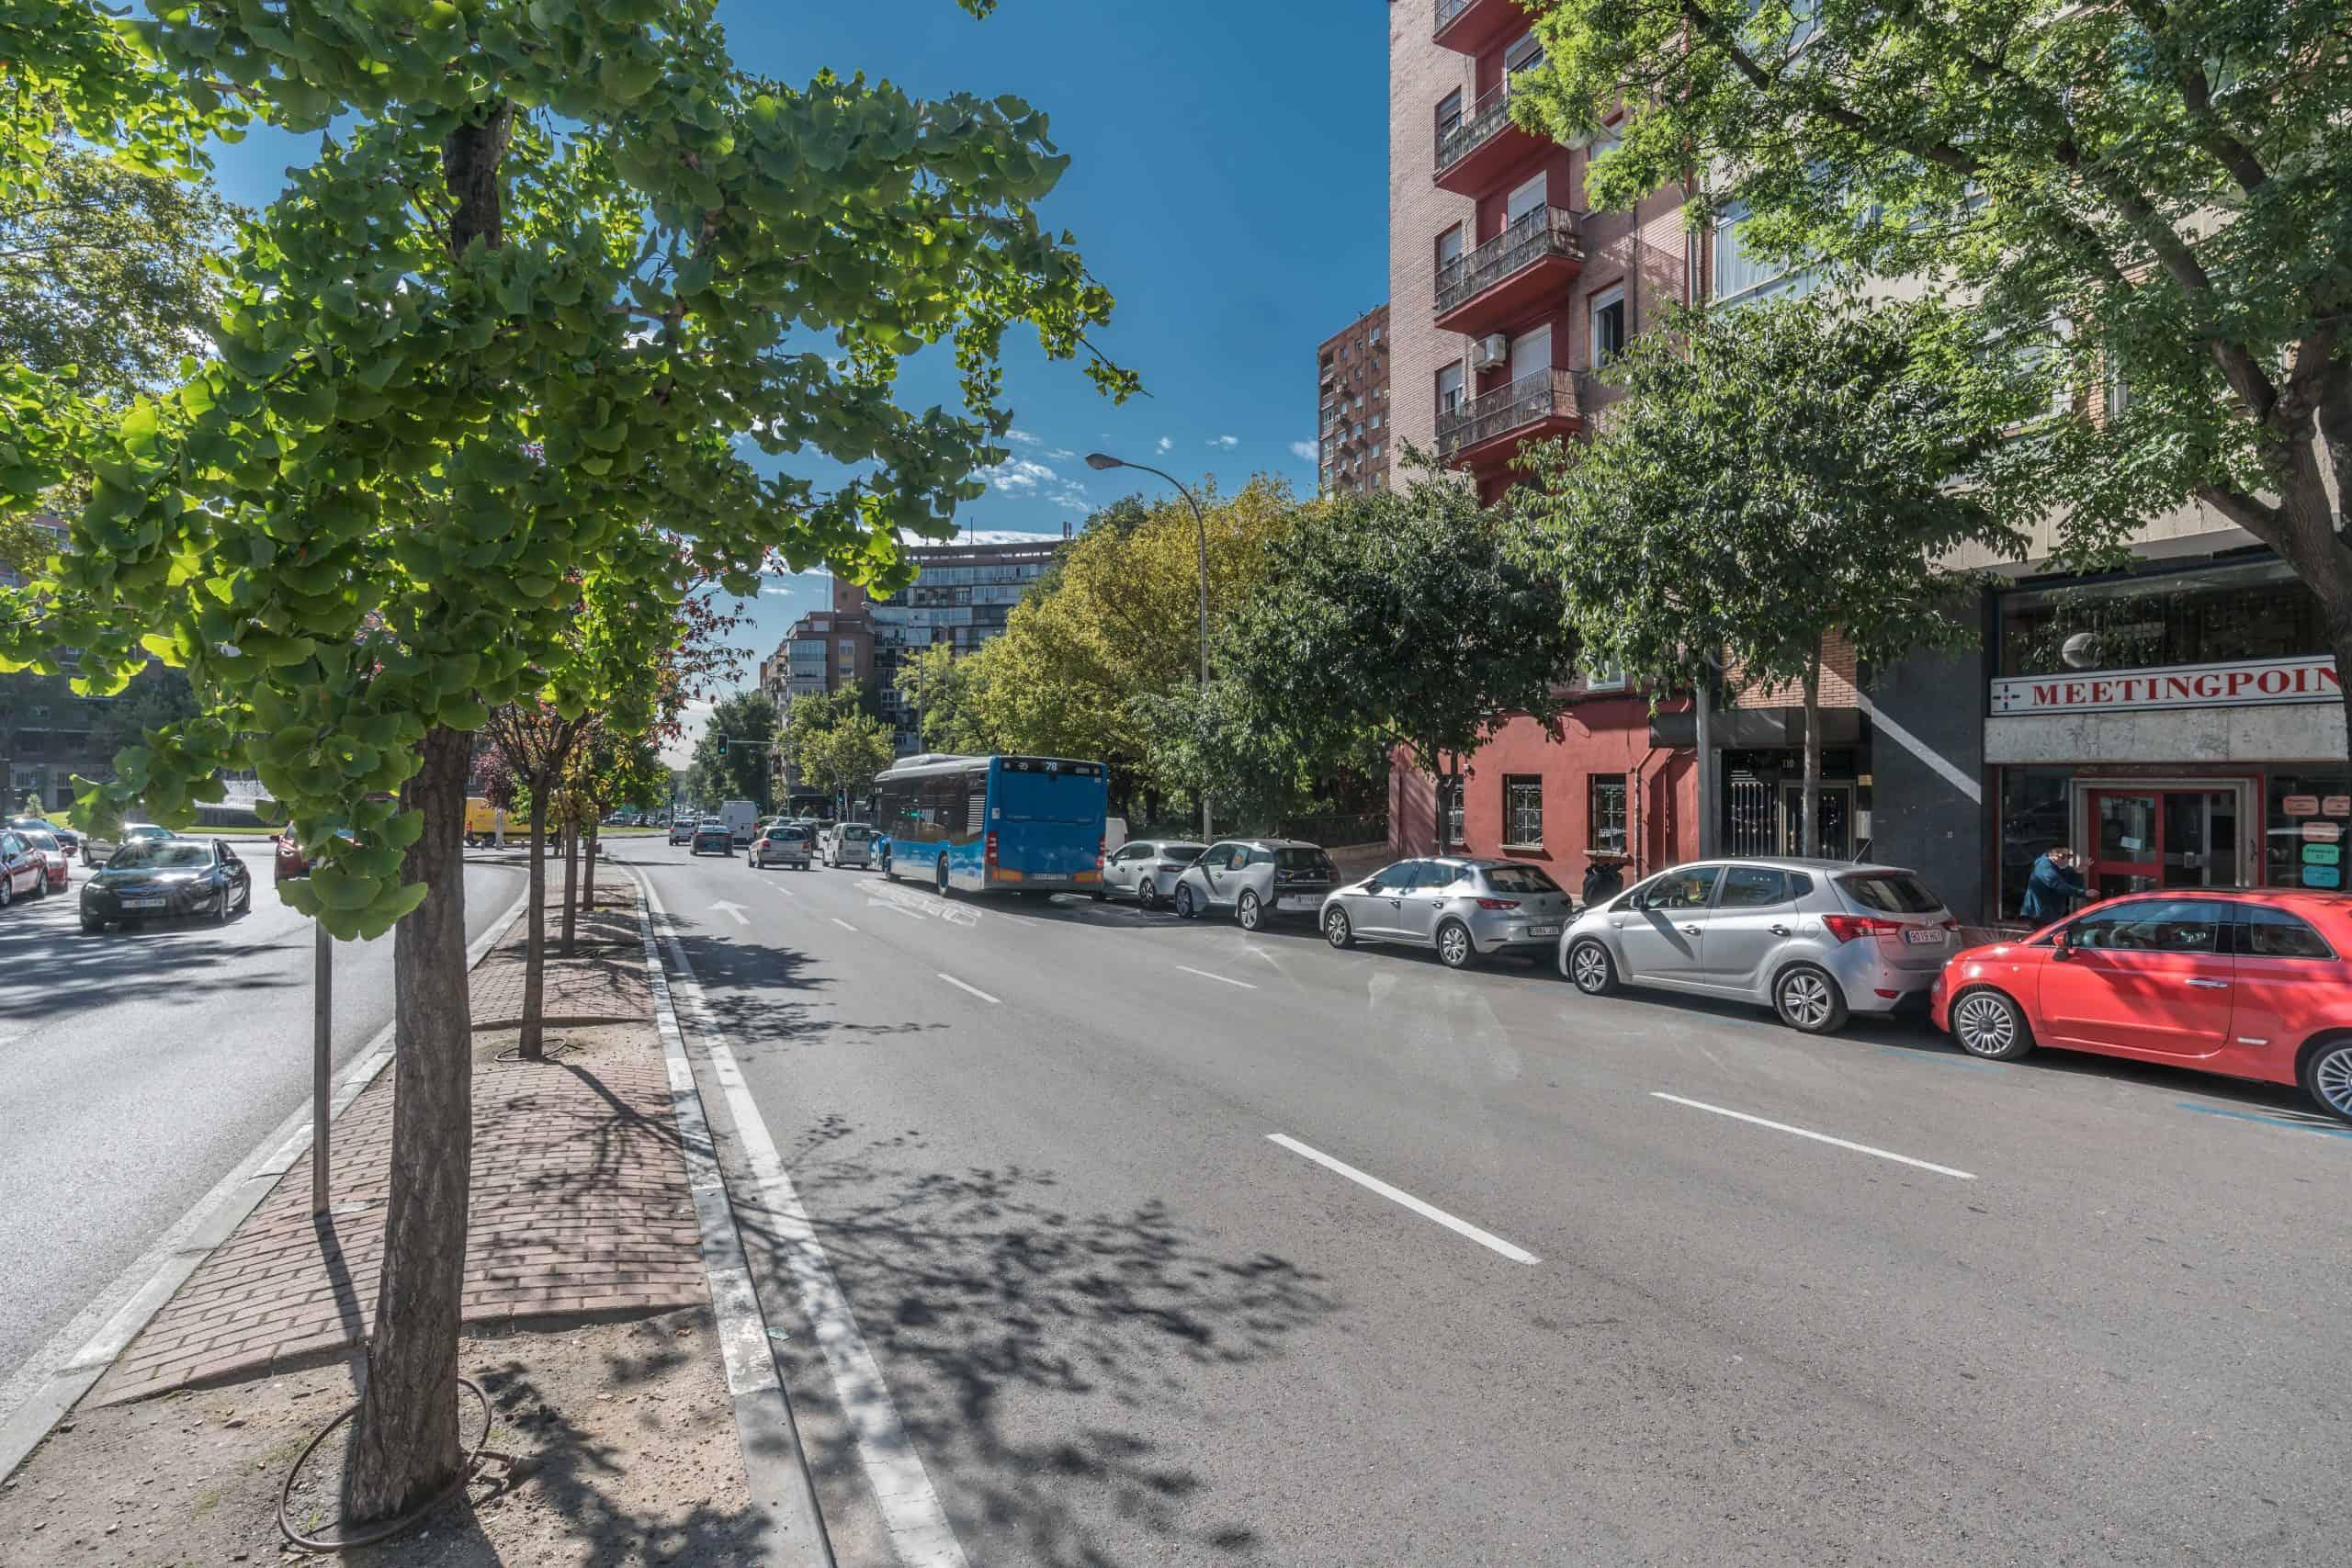 Agencia Inmobiliaria de Madrid-FUTUROCASA-Zona ARGANZUELA-EMBAJADORES-LEGAZPI -calle EMBAJADORES 108-EXTERIORES (1)